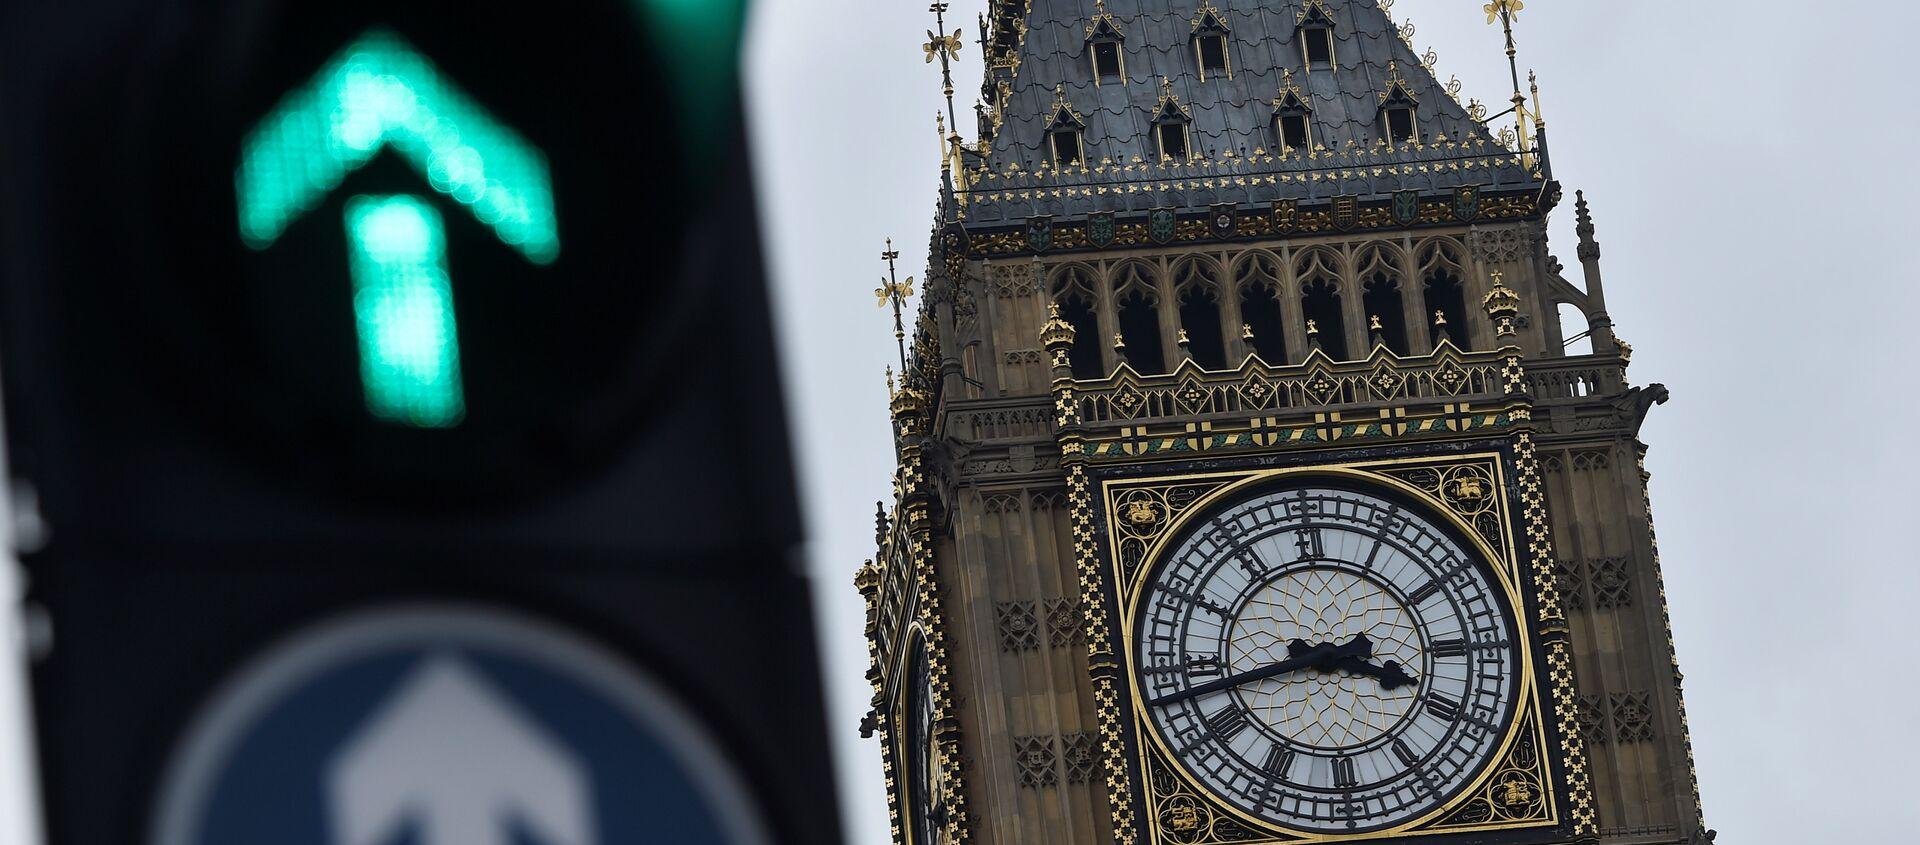 The Big Ben clocktower is seen in London, Britain, 12 March - Sputnik France, 1920, 29.01.2020